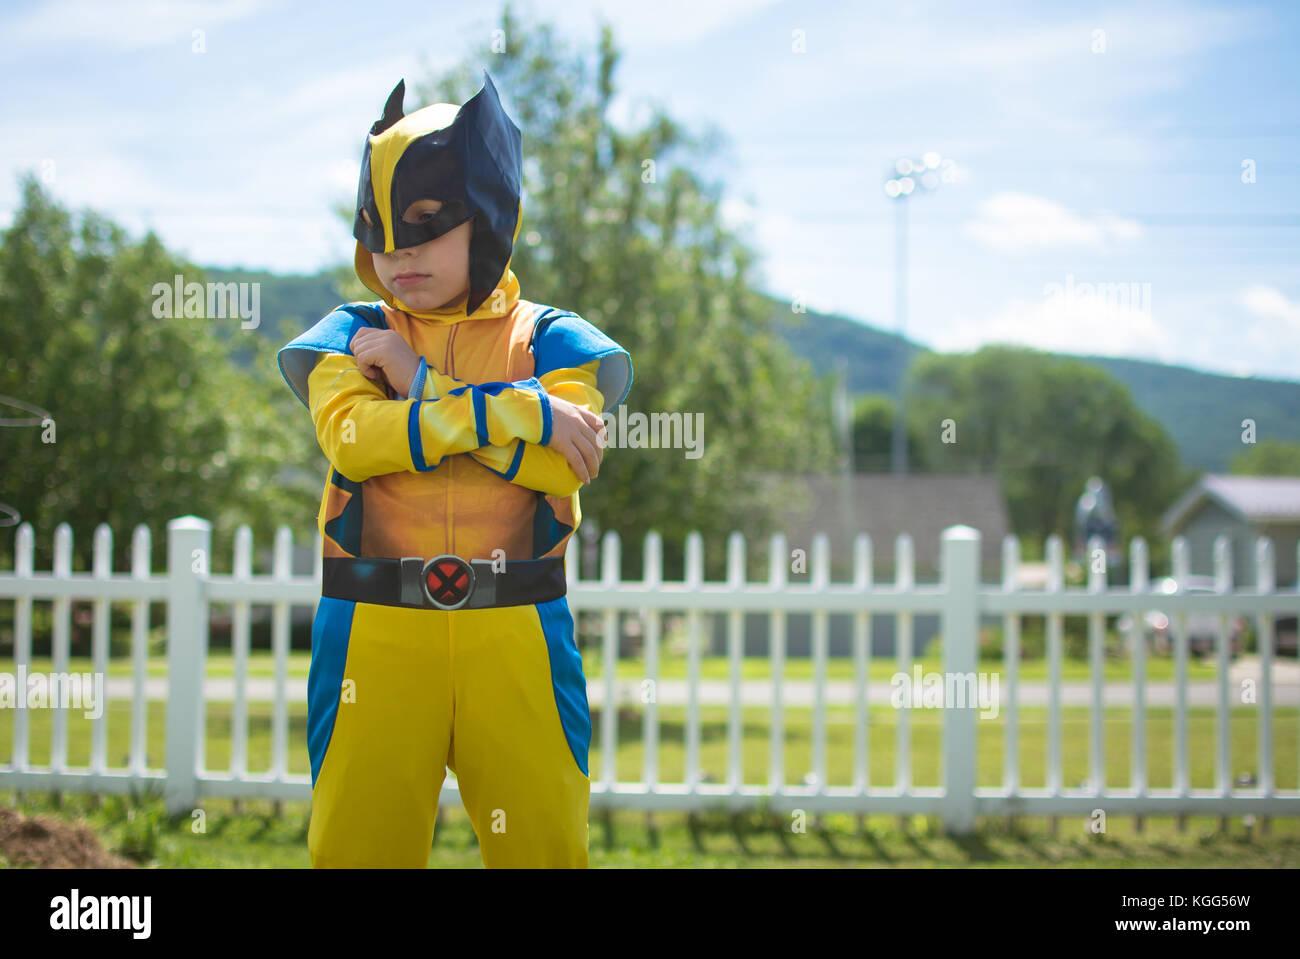 Un jeune garçon porte un costume standing outside with folded arms Photo Stock